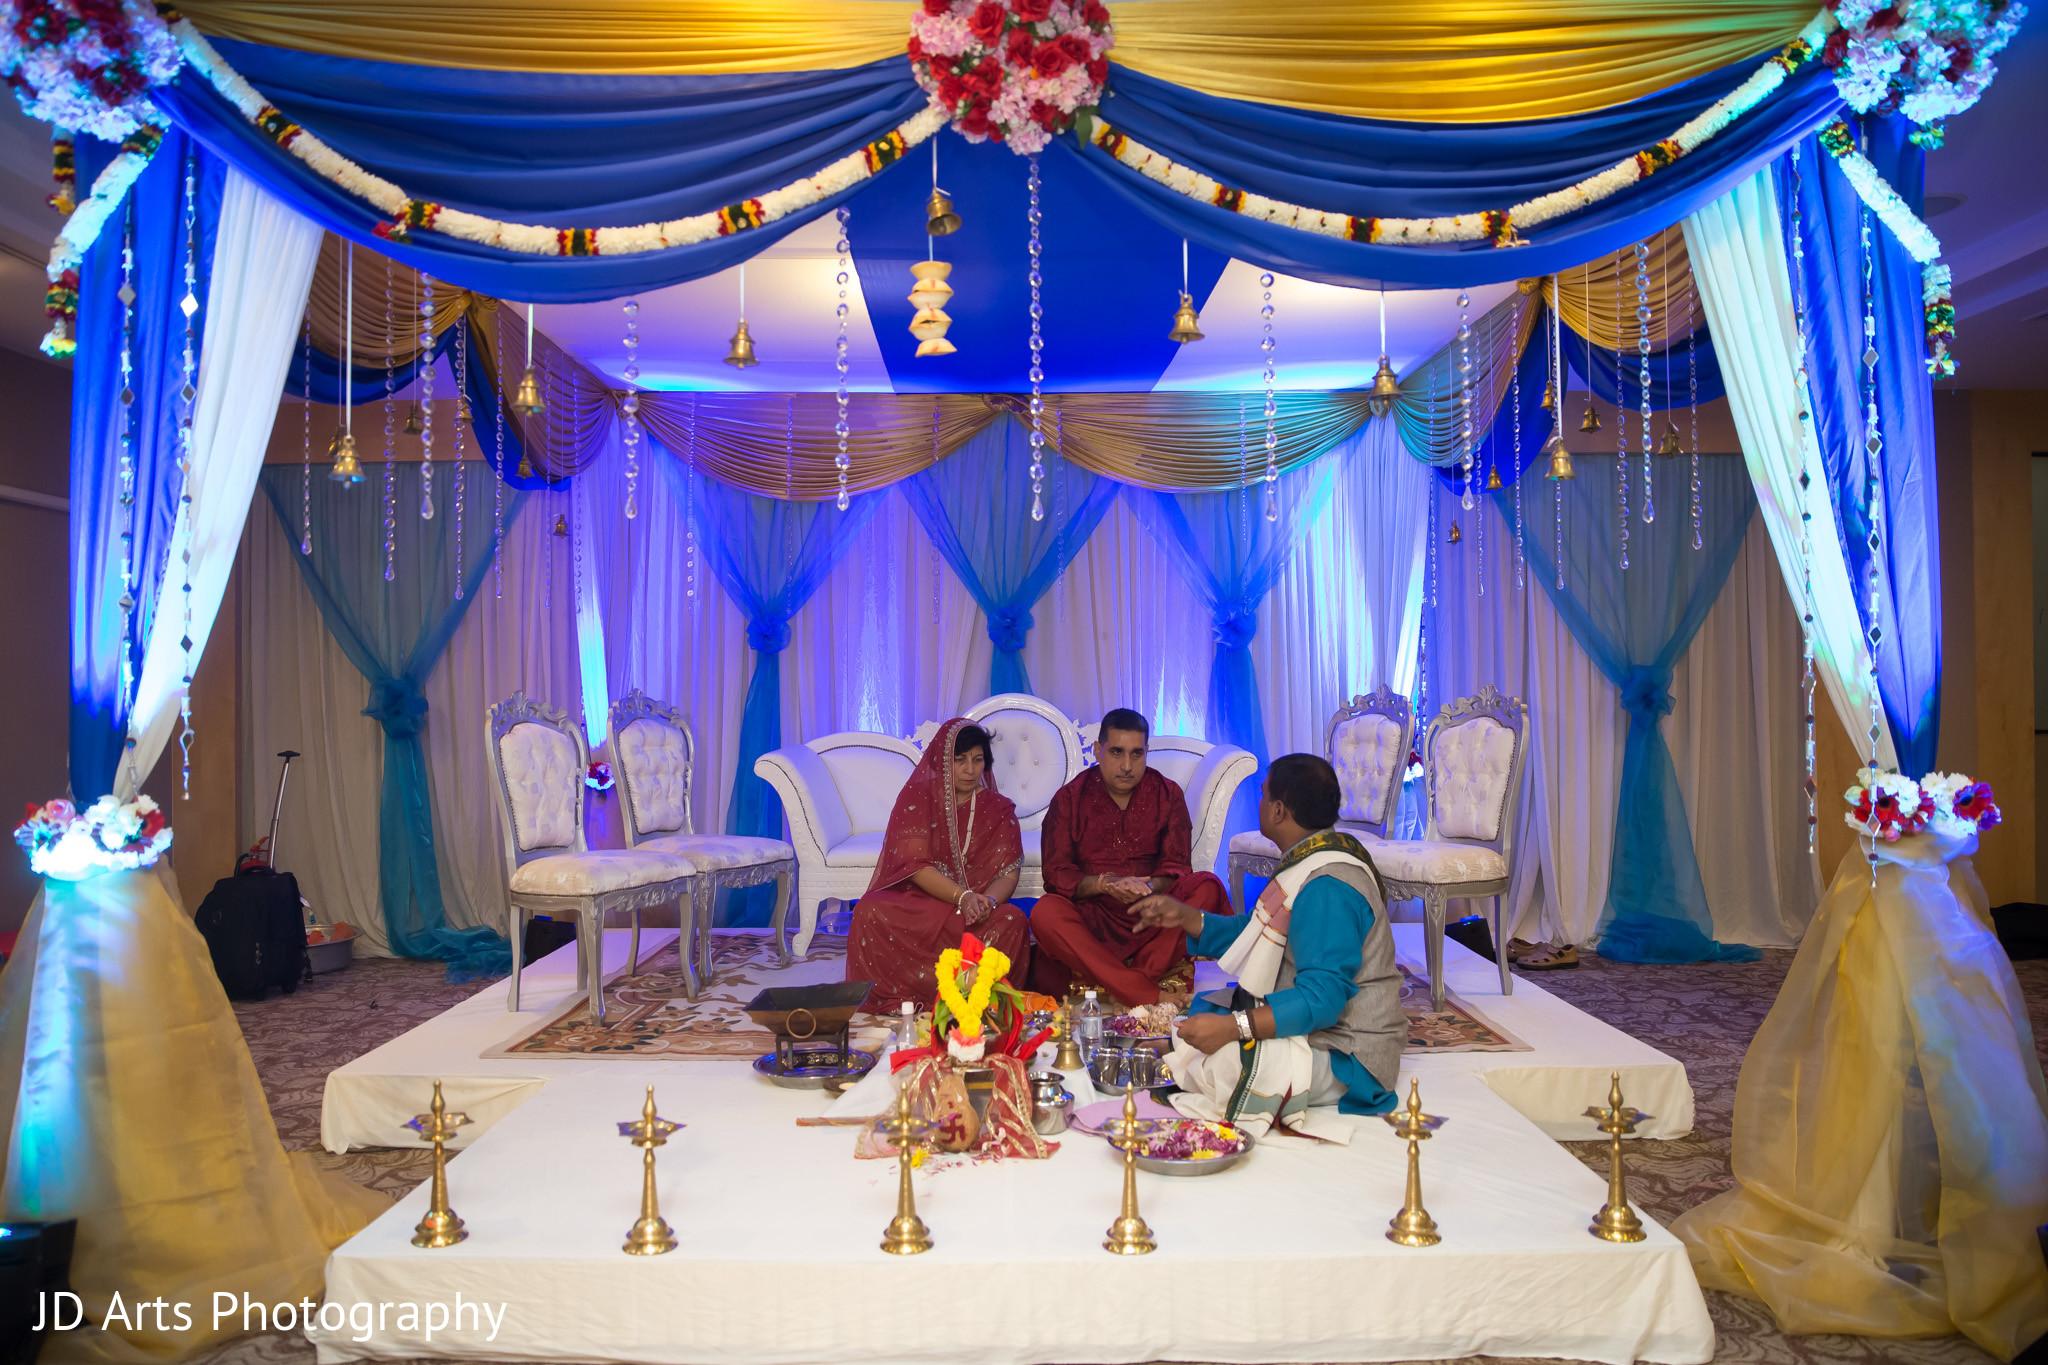 Wedding decoration shop kl images wedding dress decoration and wedding decoration shop malaysia images wedding dress decoration wedding decoration shop in kuala lumpur image collections junglespirit Gallery